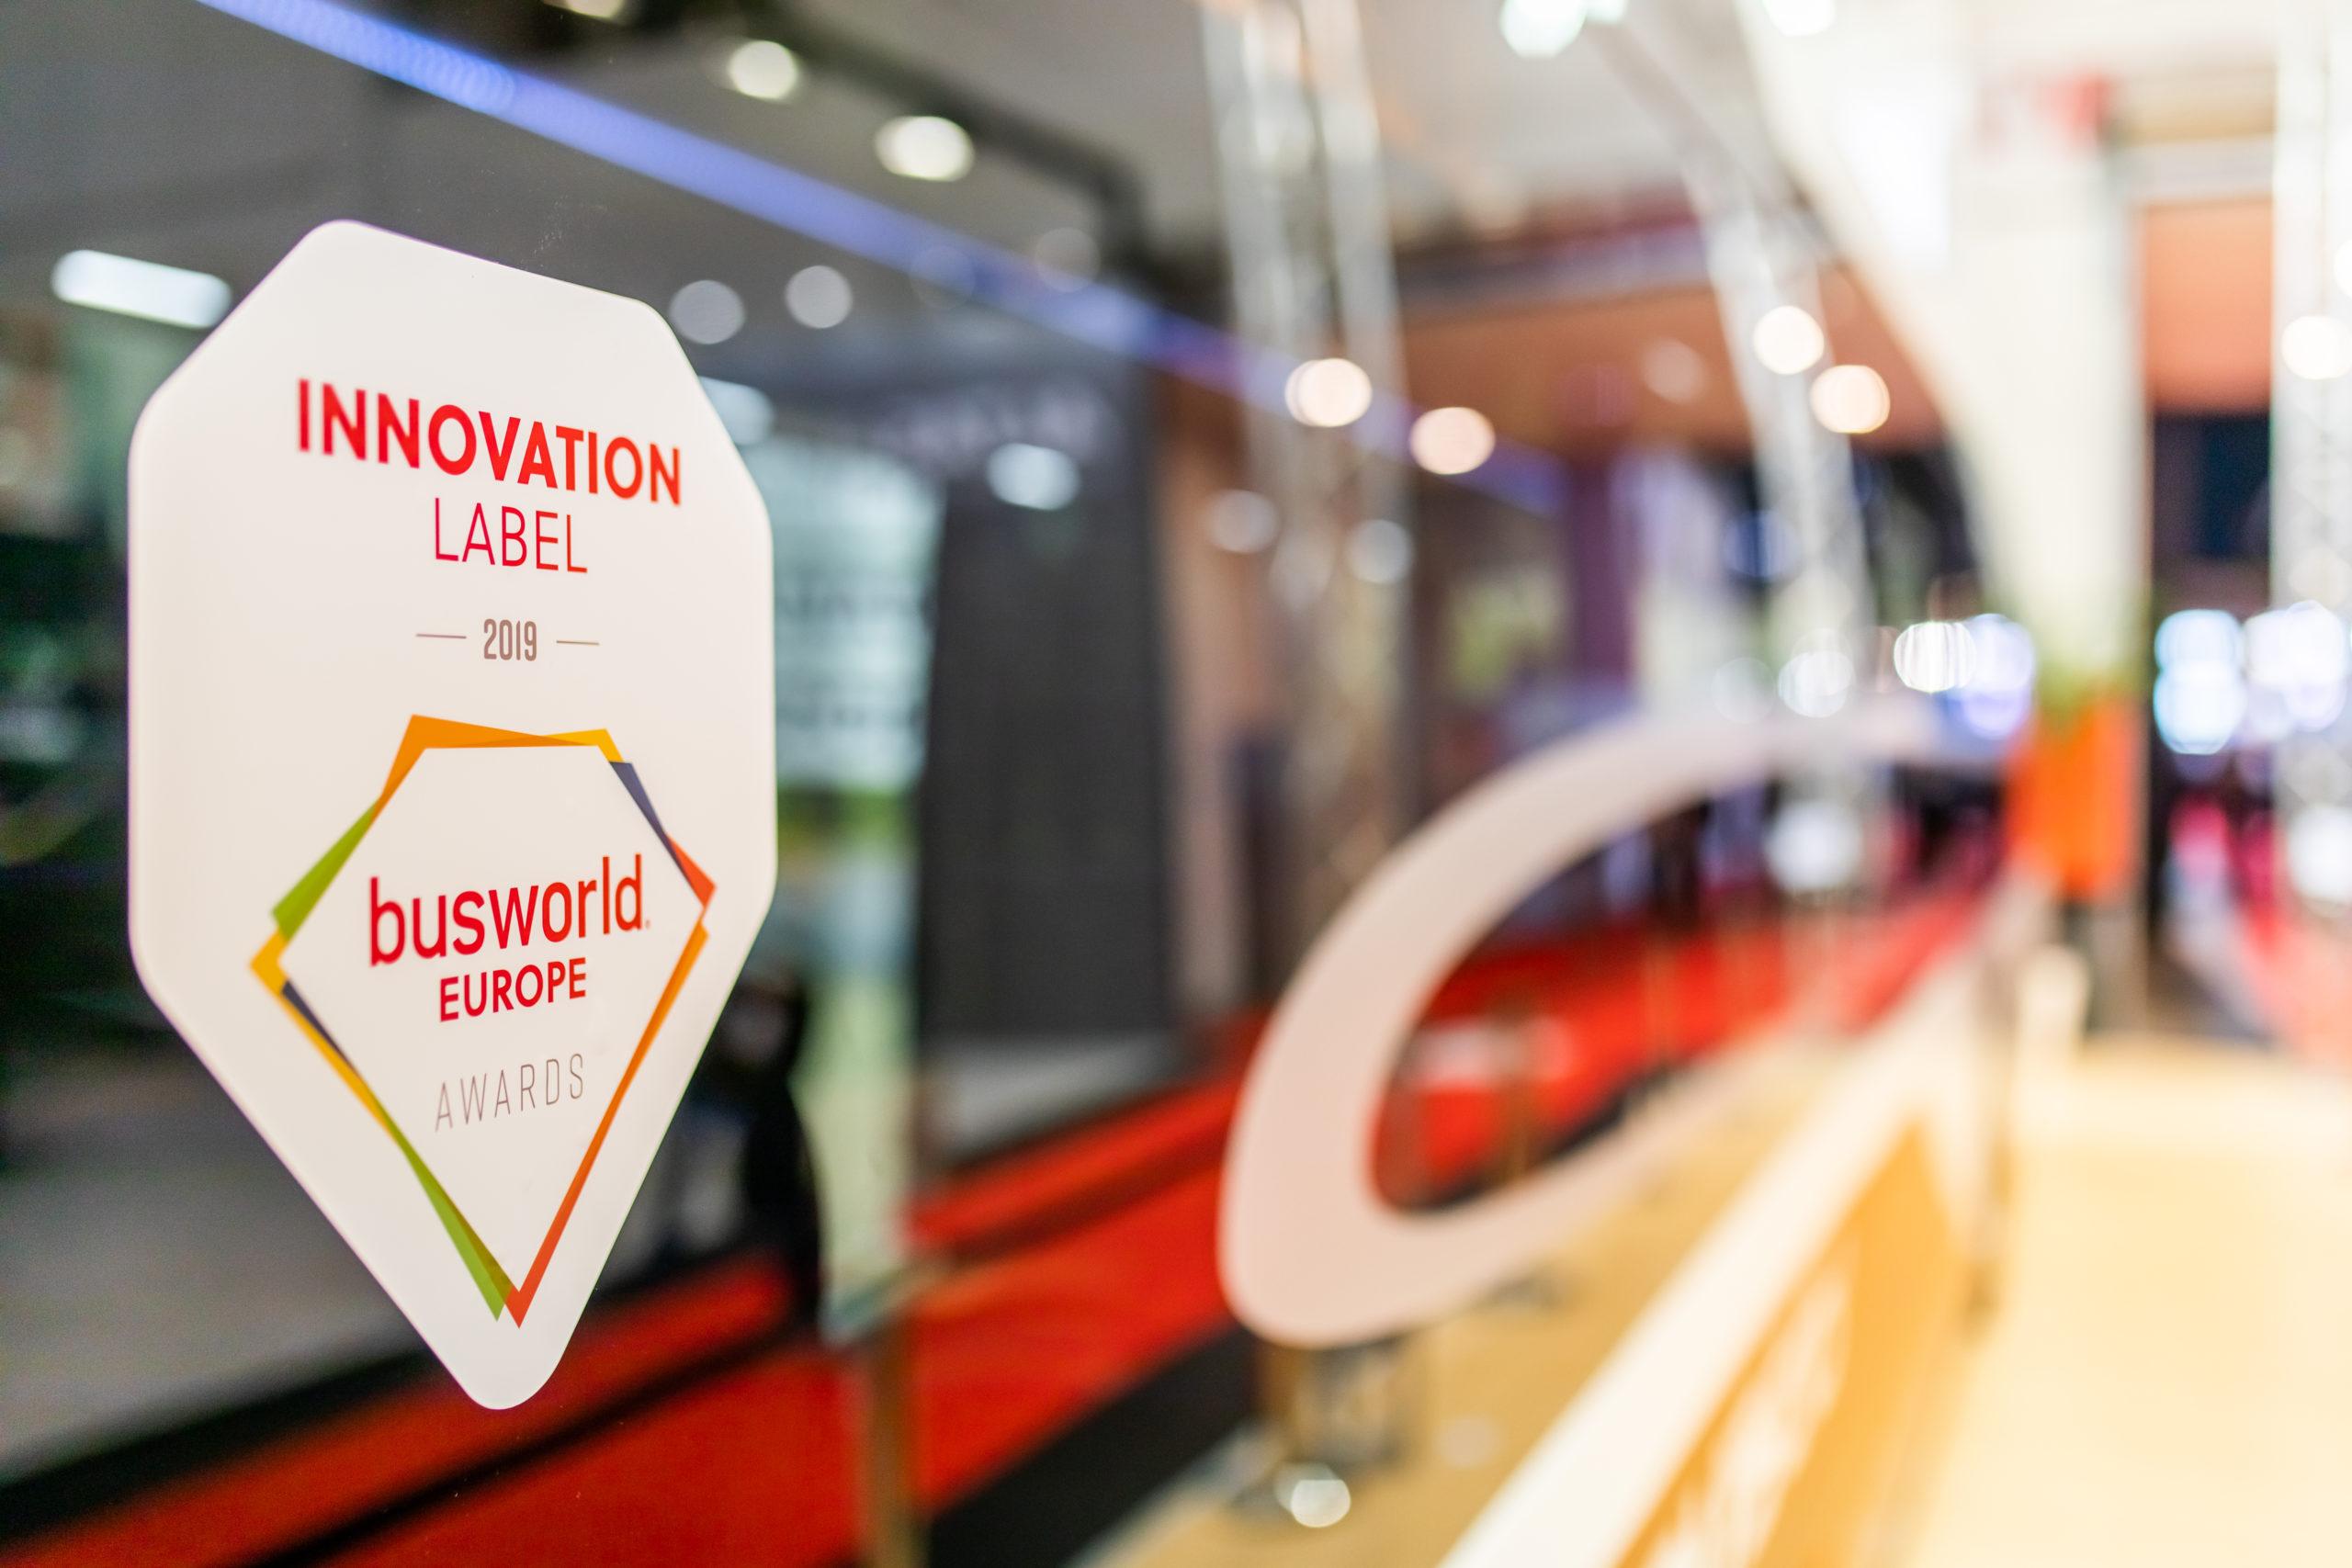 Busworld Innovation Ebusco 3.0